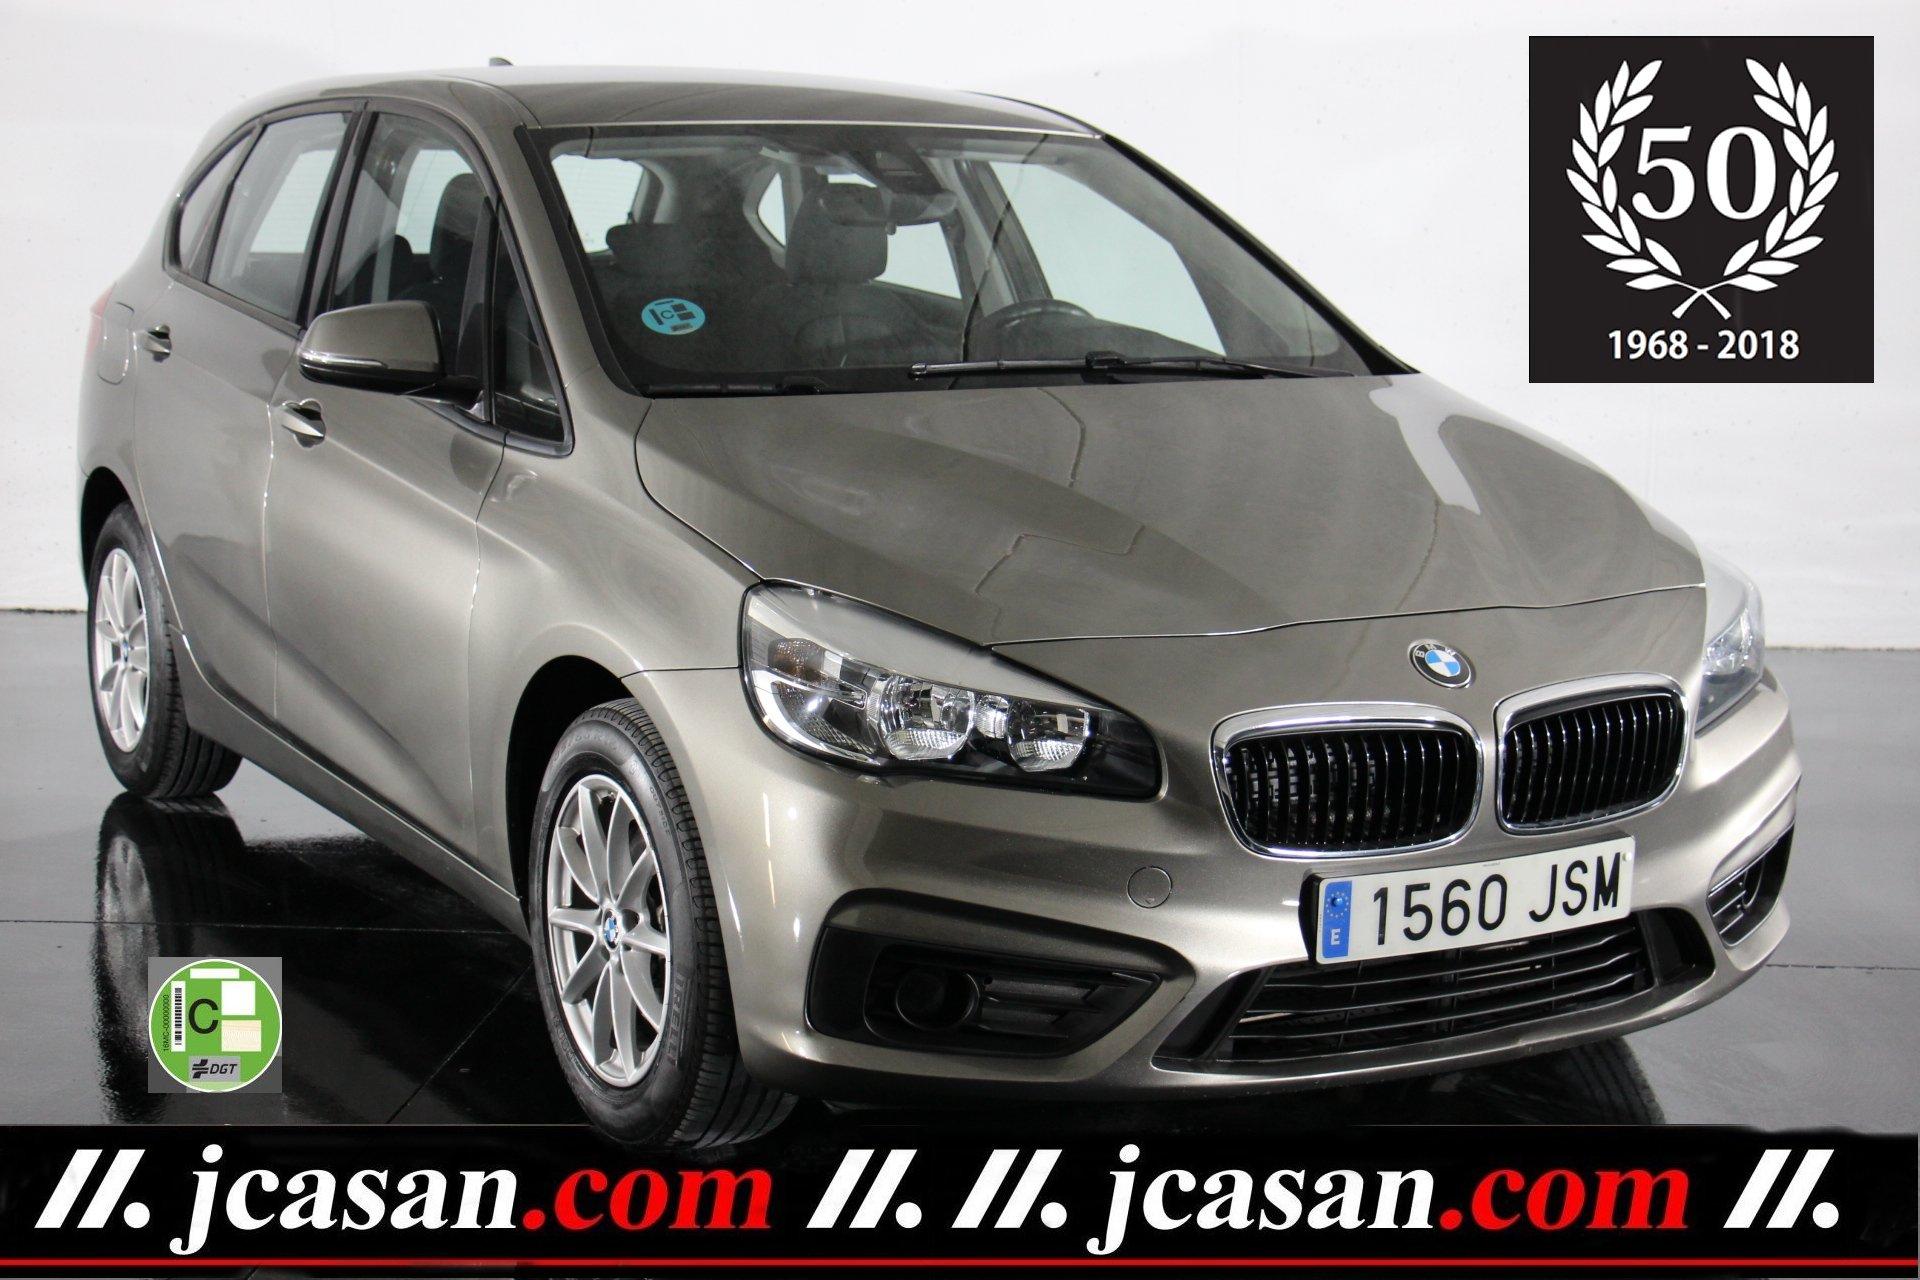 BMW 216d Active Tourer 116 CV 6 Vel  ref1560